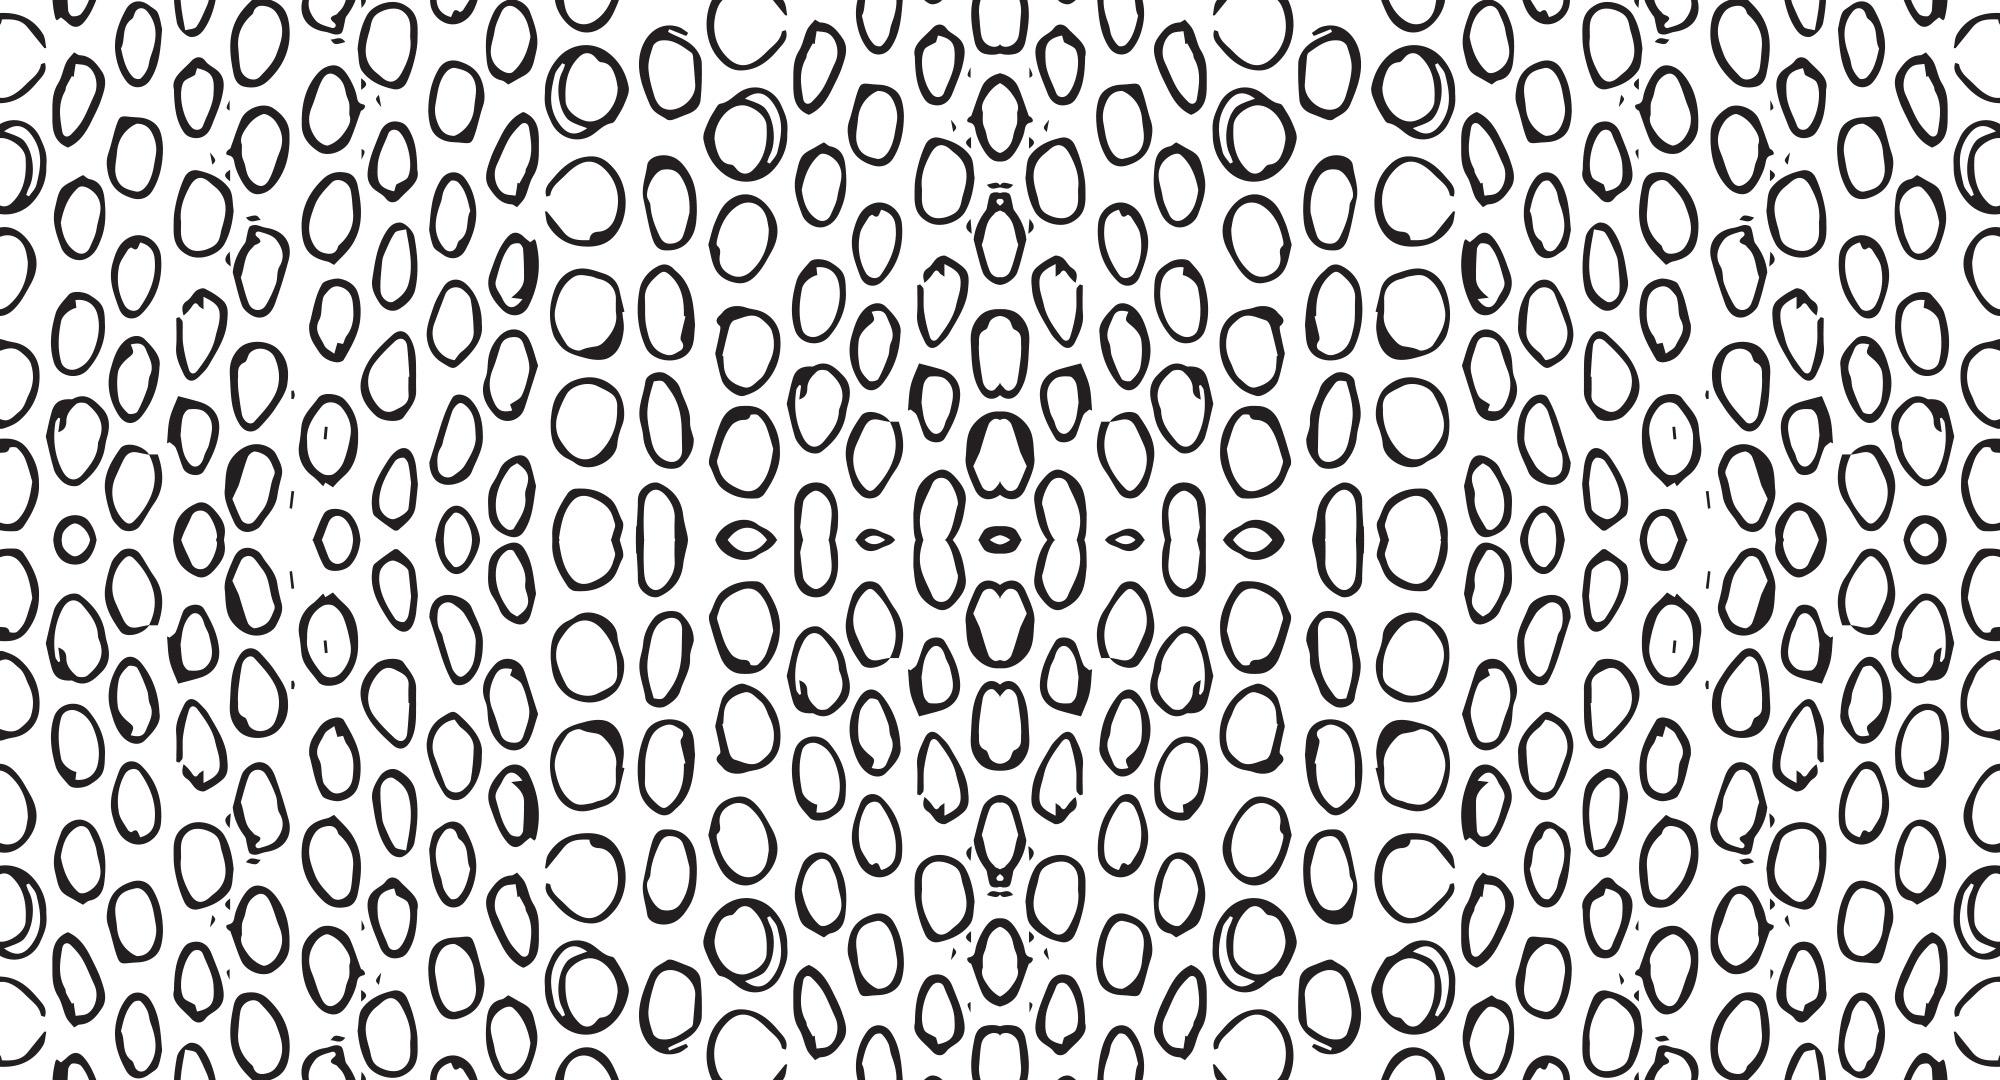 Grip_2_wrap.jpg